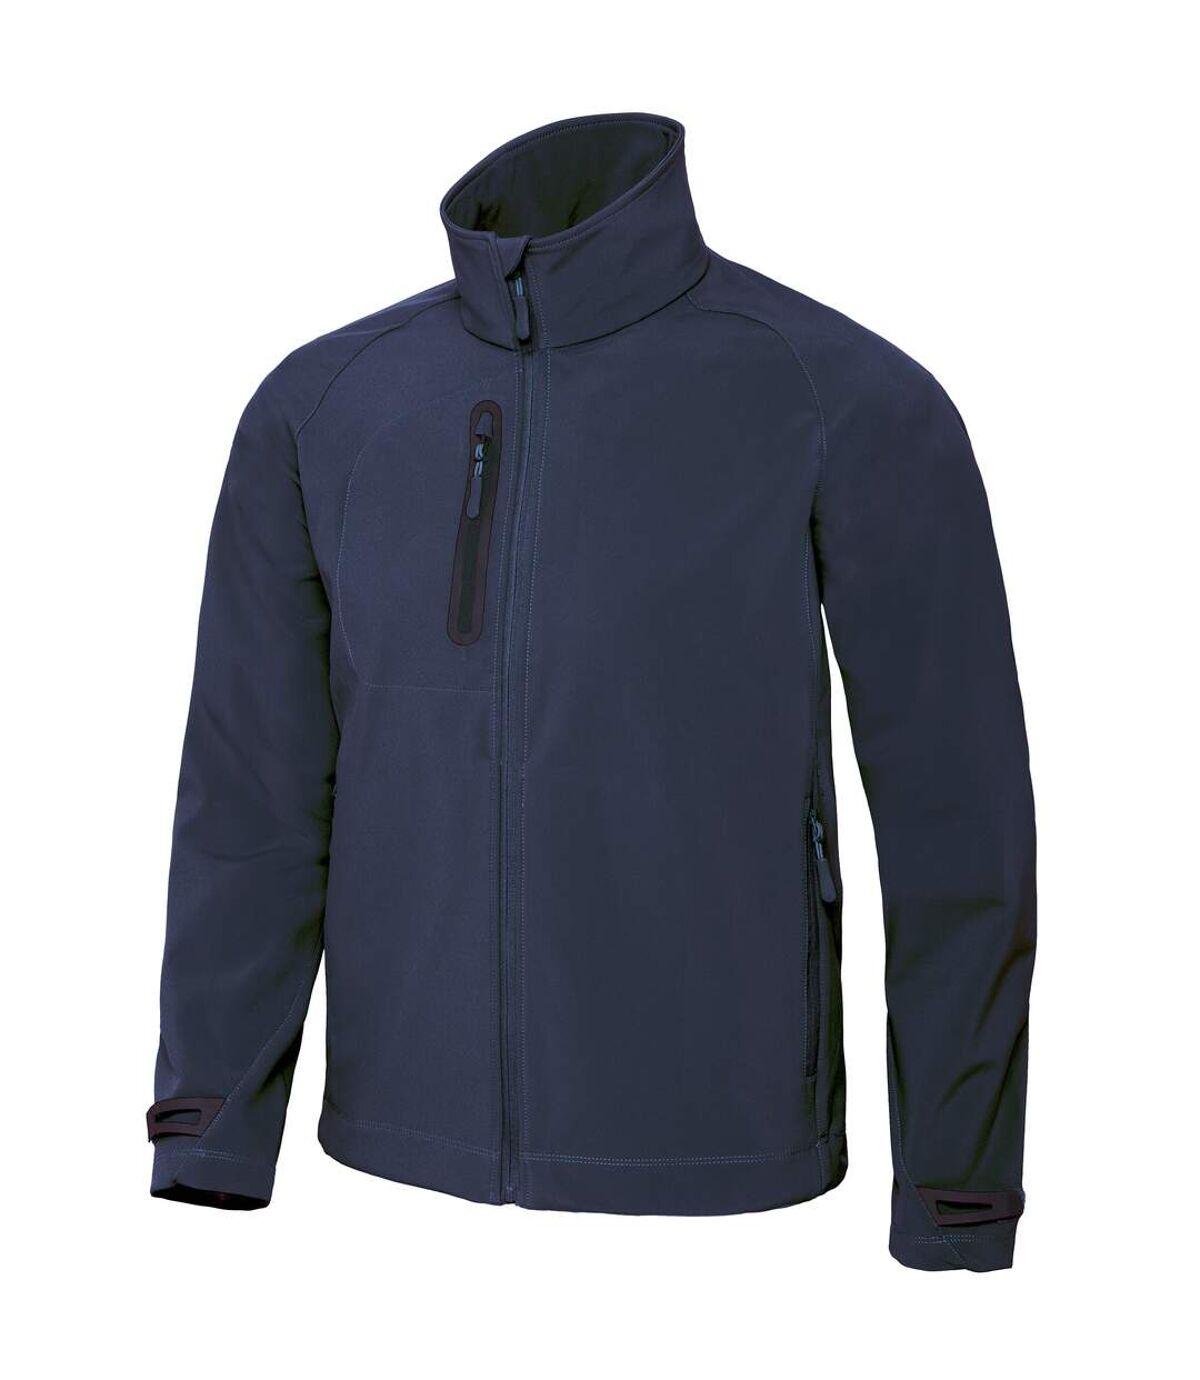 B&C Mens X-Lite 3 Layer Softshell Performance Jacket (Navy) - UTRW3036